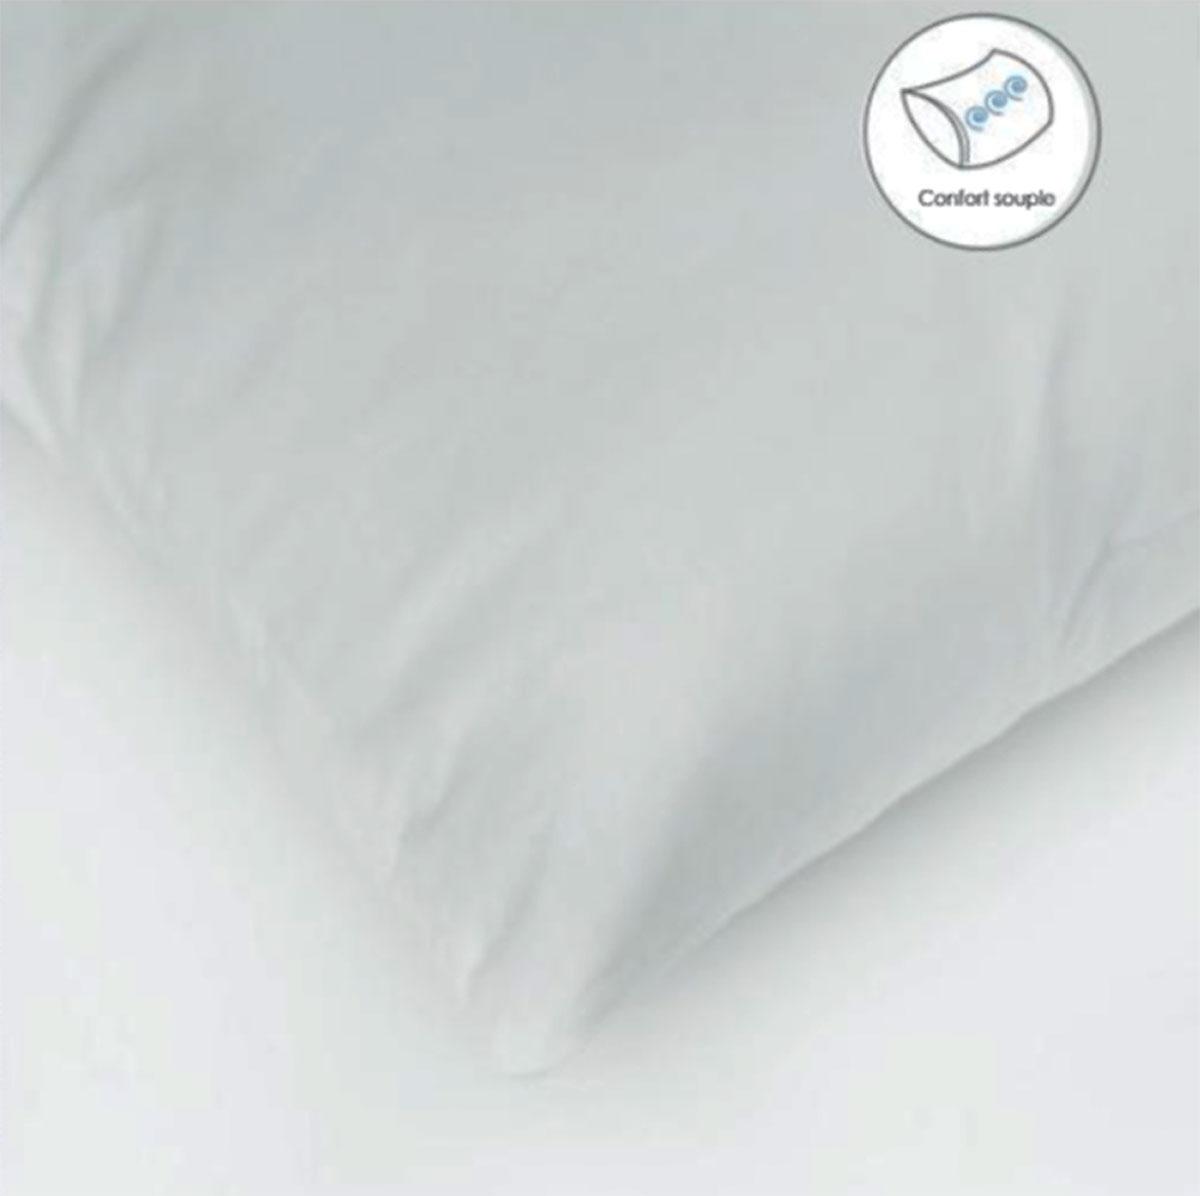 Oreiller Carré Enveloppe Coton Protection - Blanc - 60 x 60cm